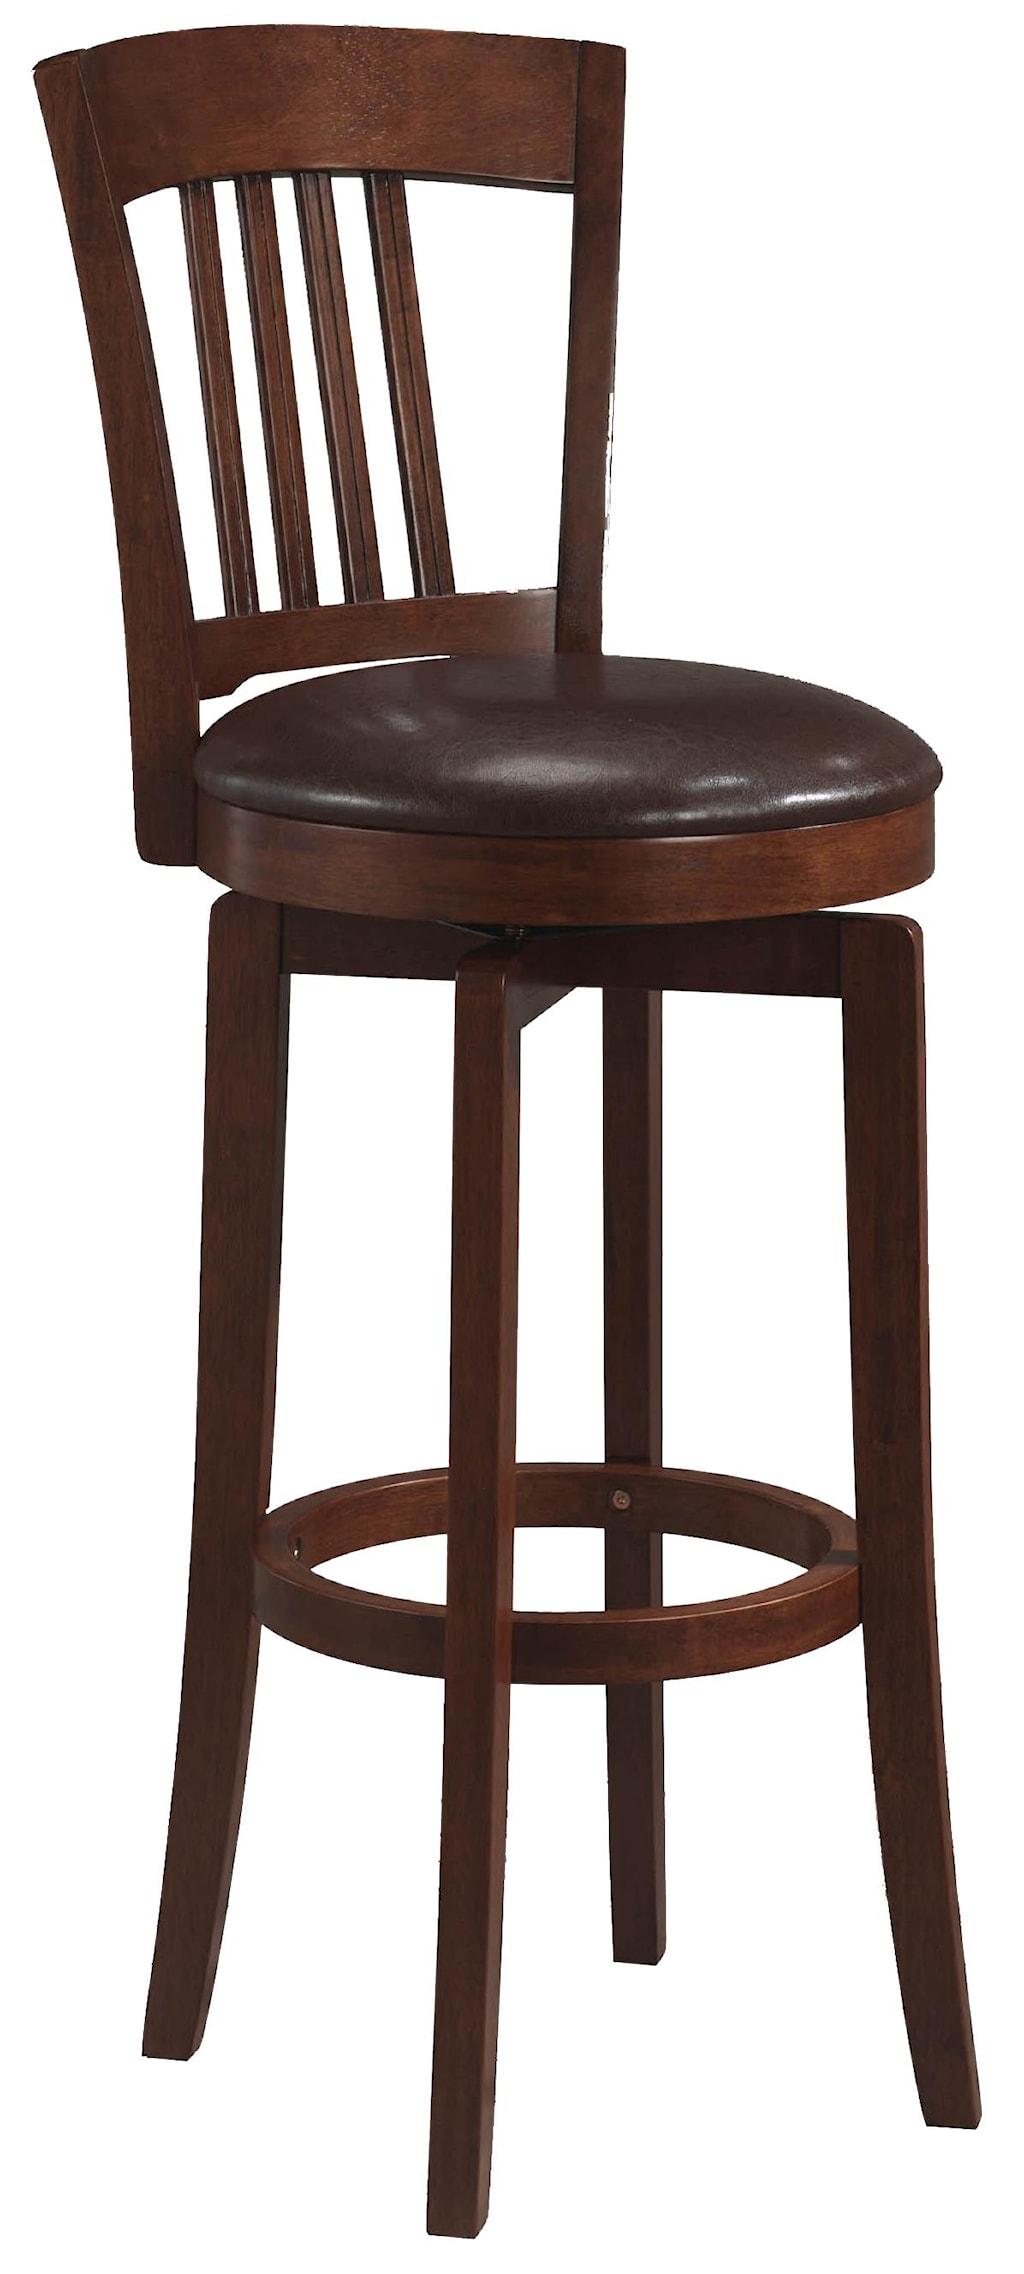 Wood Stools 30 Bar Height Canton Swivel Stool Rotmans Bar Stools